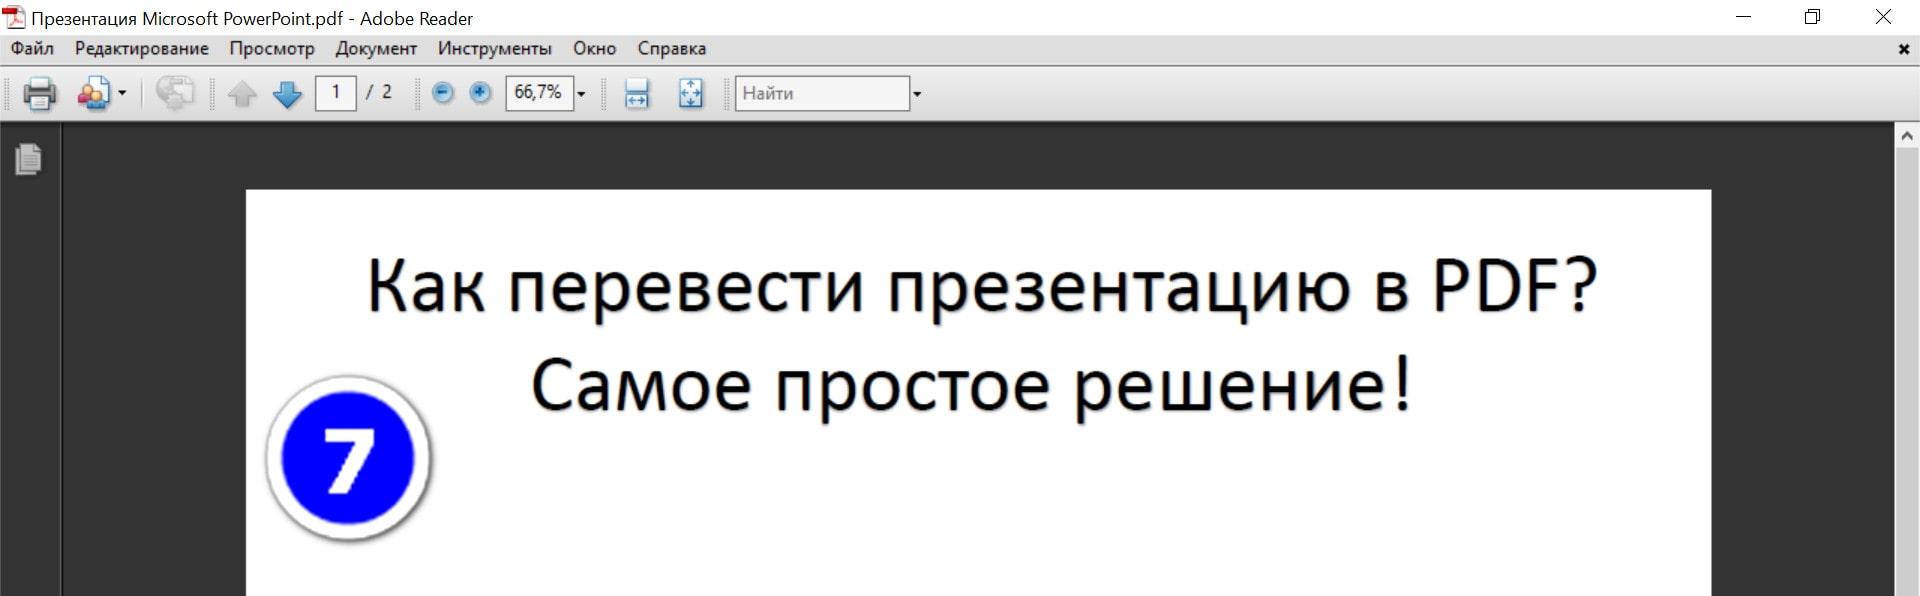 Презентация переведена в PDF формат-min